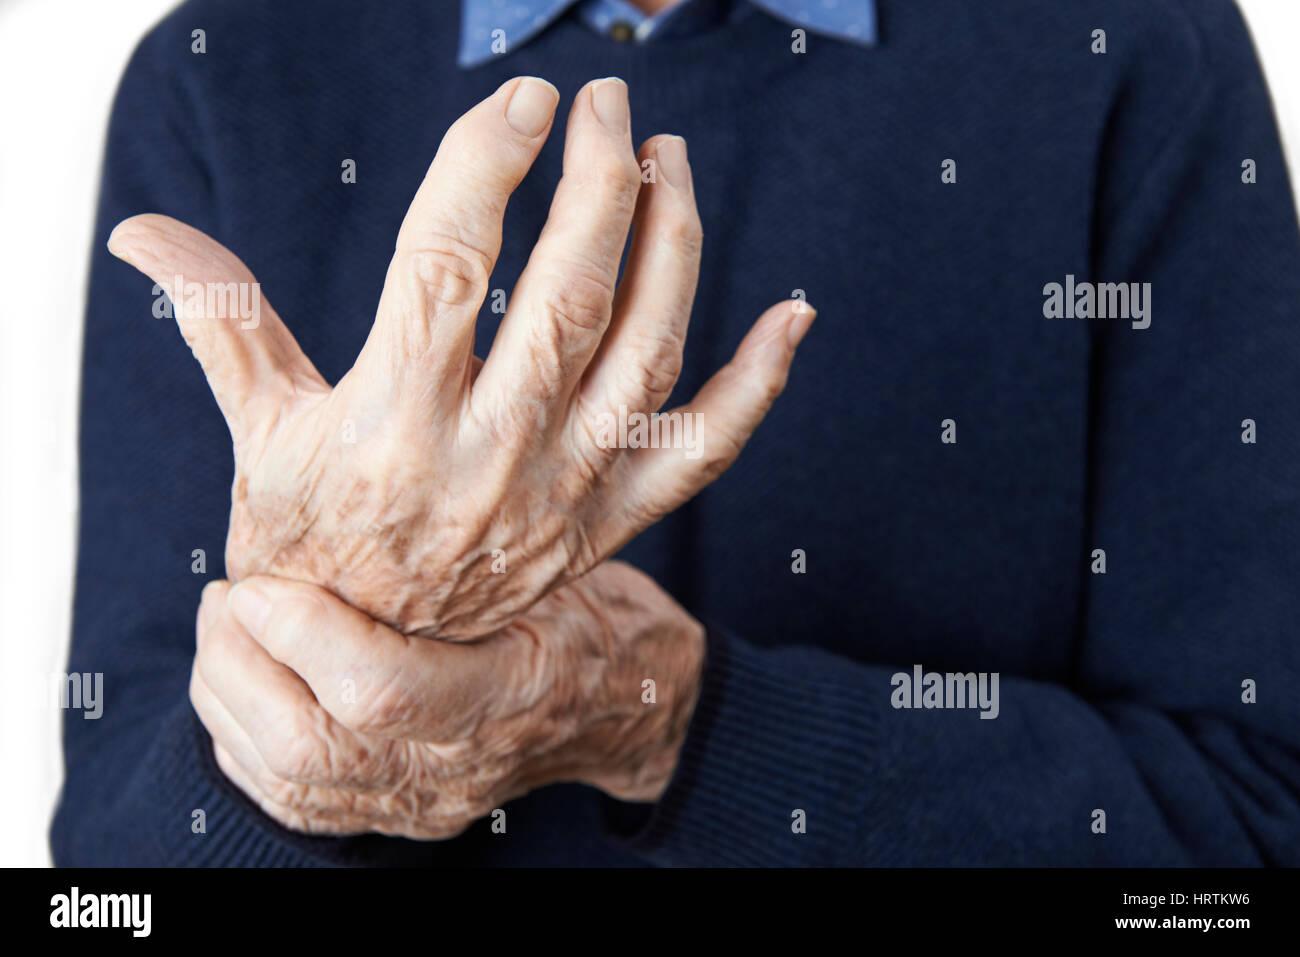 Close Up Of Senior Man Suffering With Arthritis - Stock Image